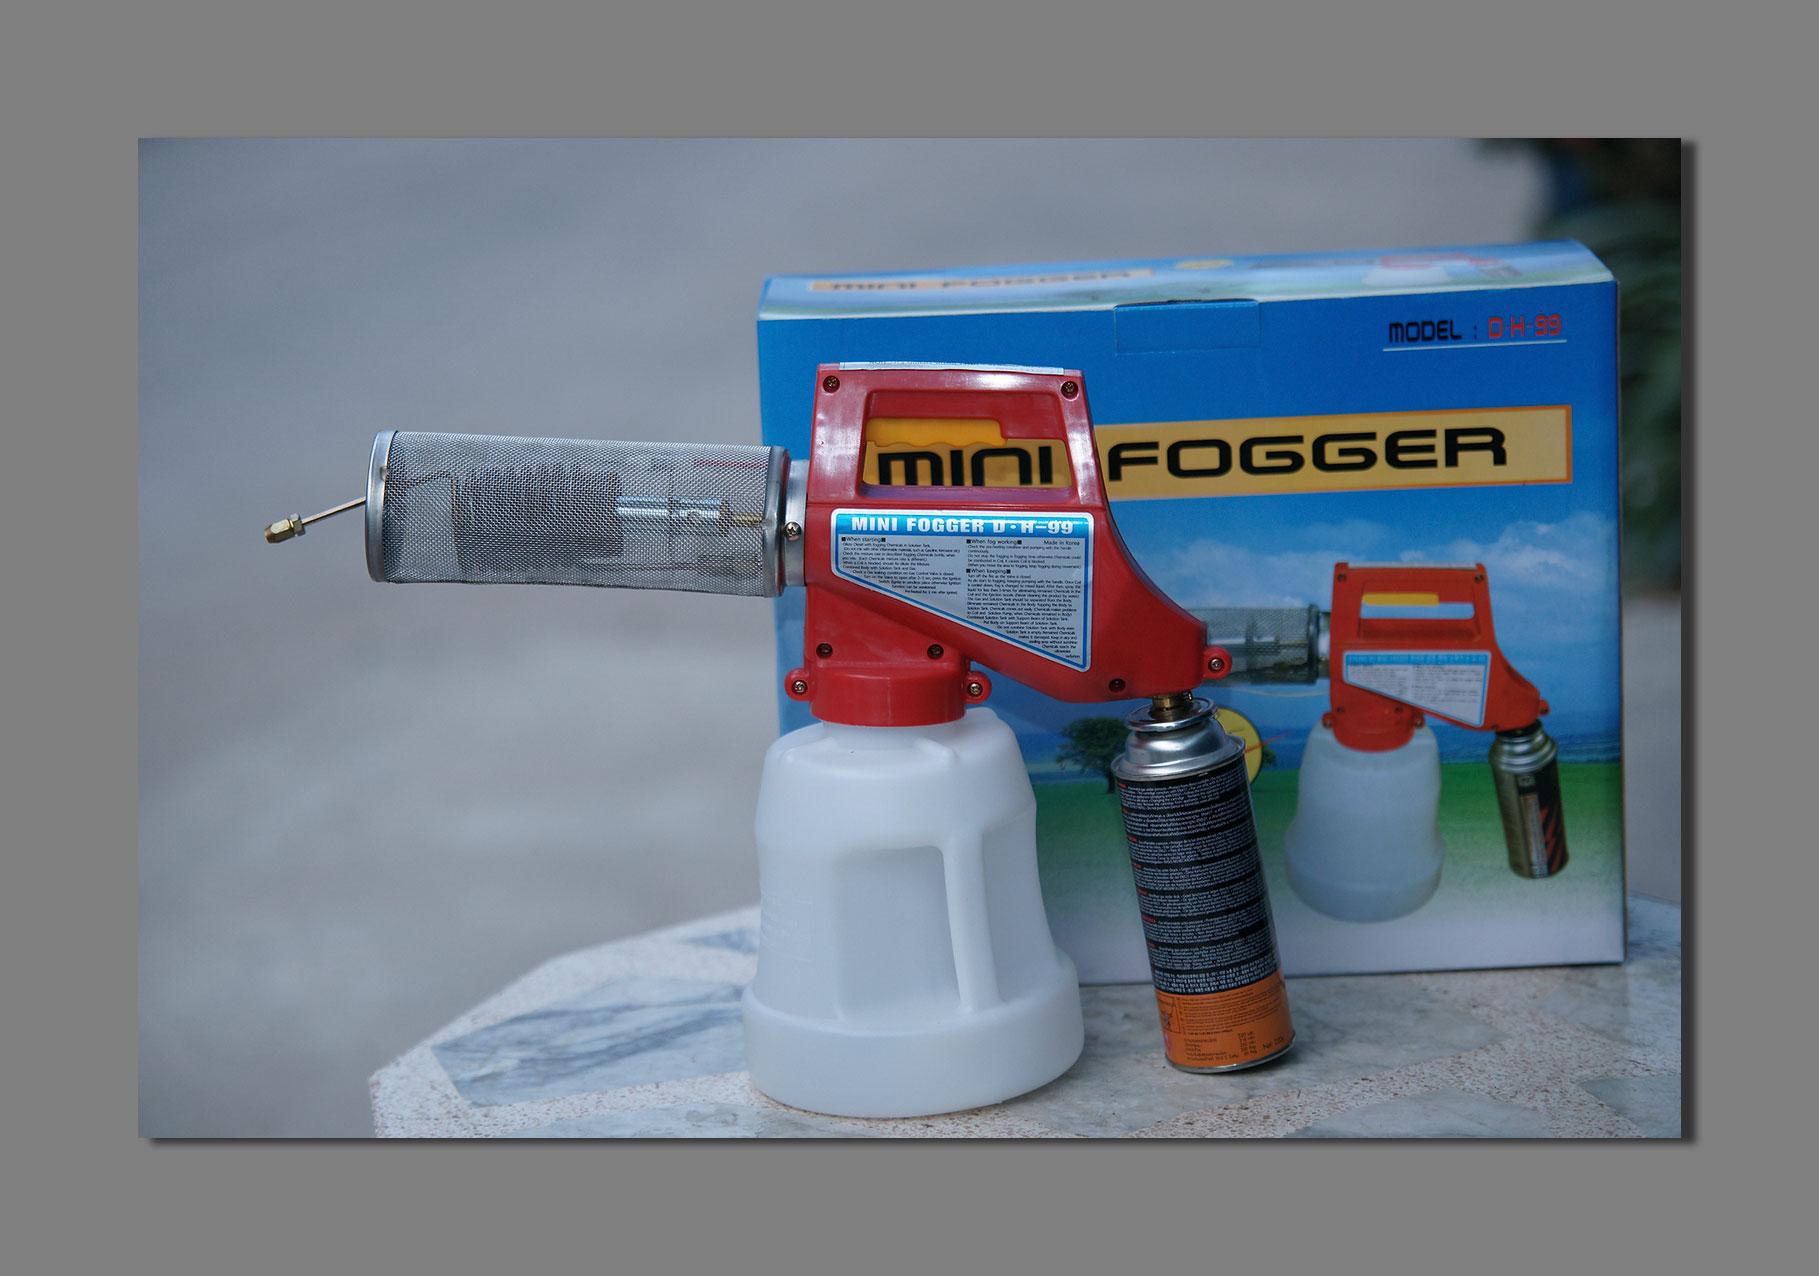 Mini Fogger เครื่องพ่นหมอกควัน สำหรับหรับกำจัดแมลง ยุง